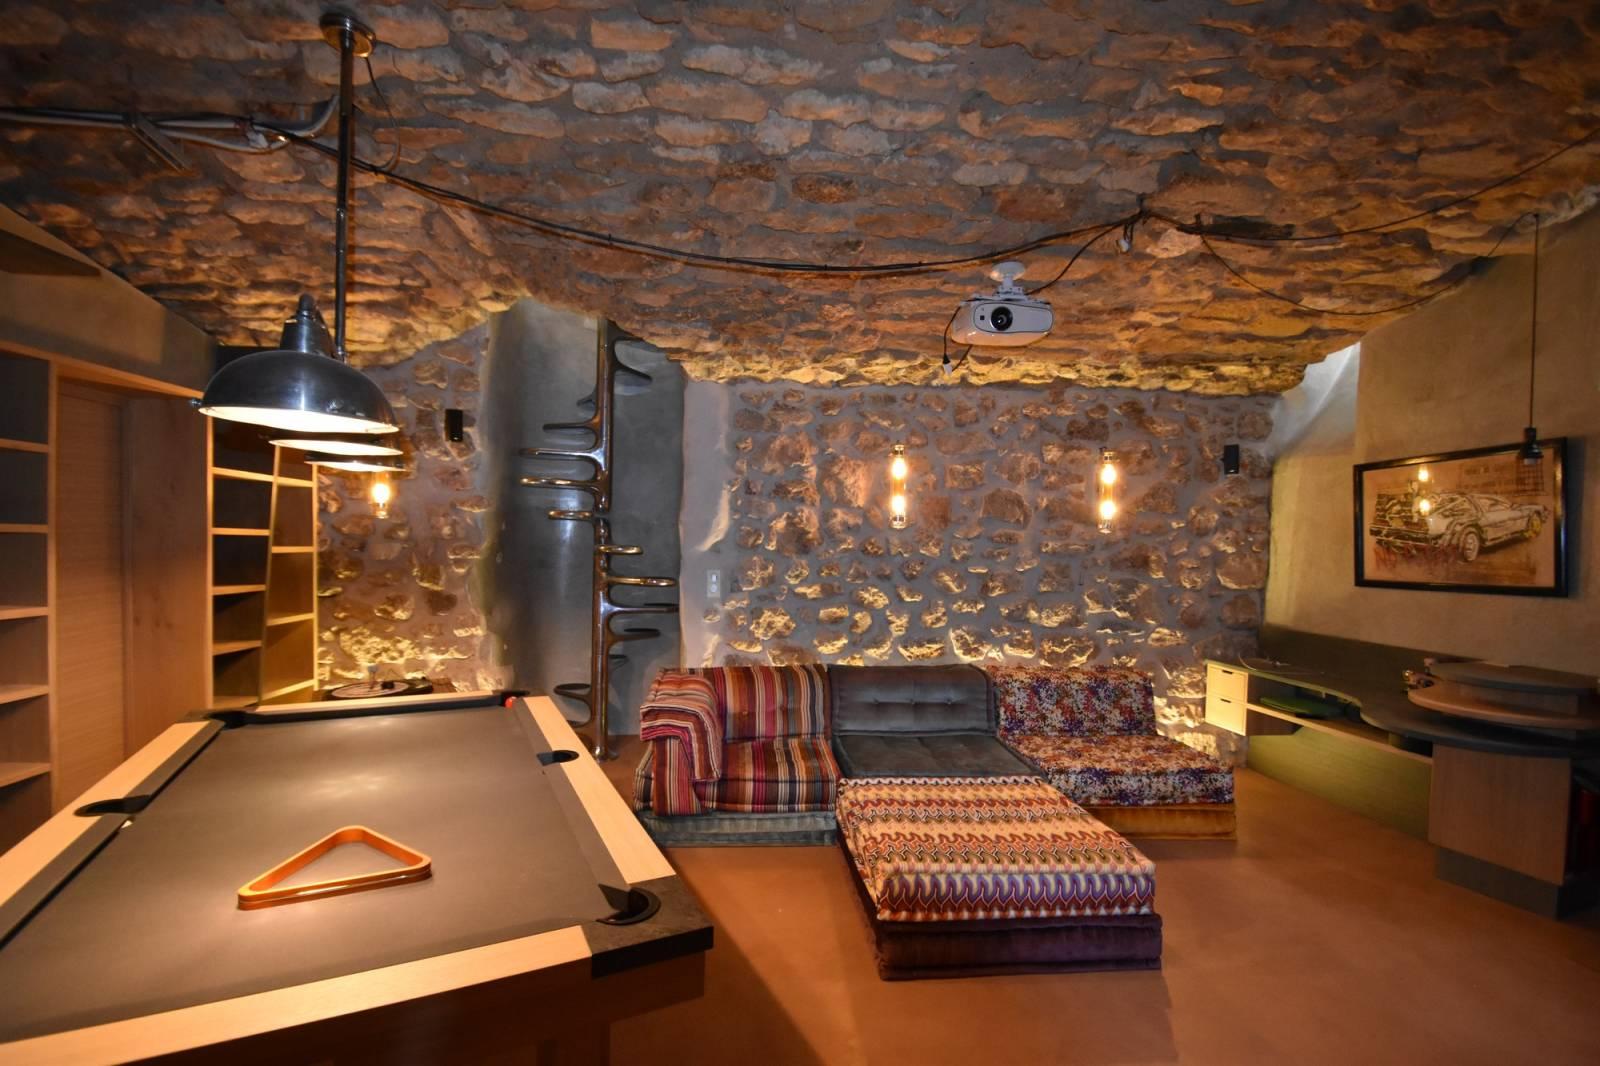 transformation d 39 une cave en salle vid o salle de jeu. Black Bedroom Furniture Sets. Home Design Ideas